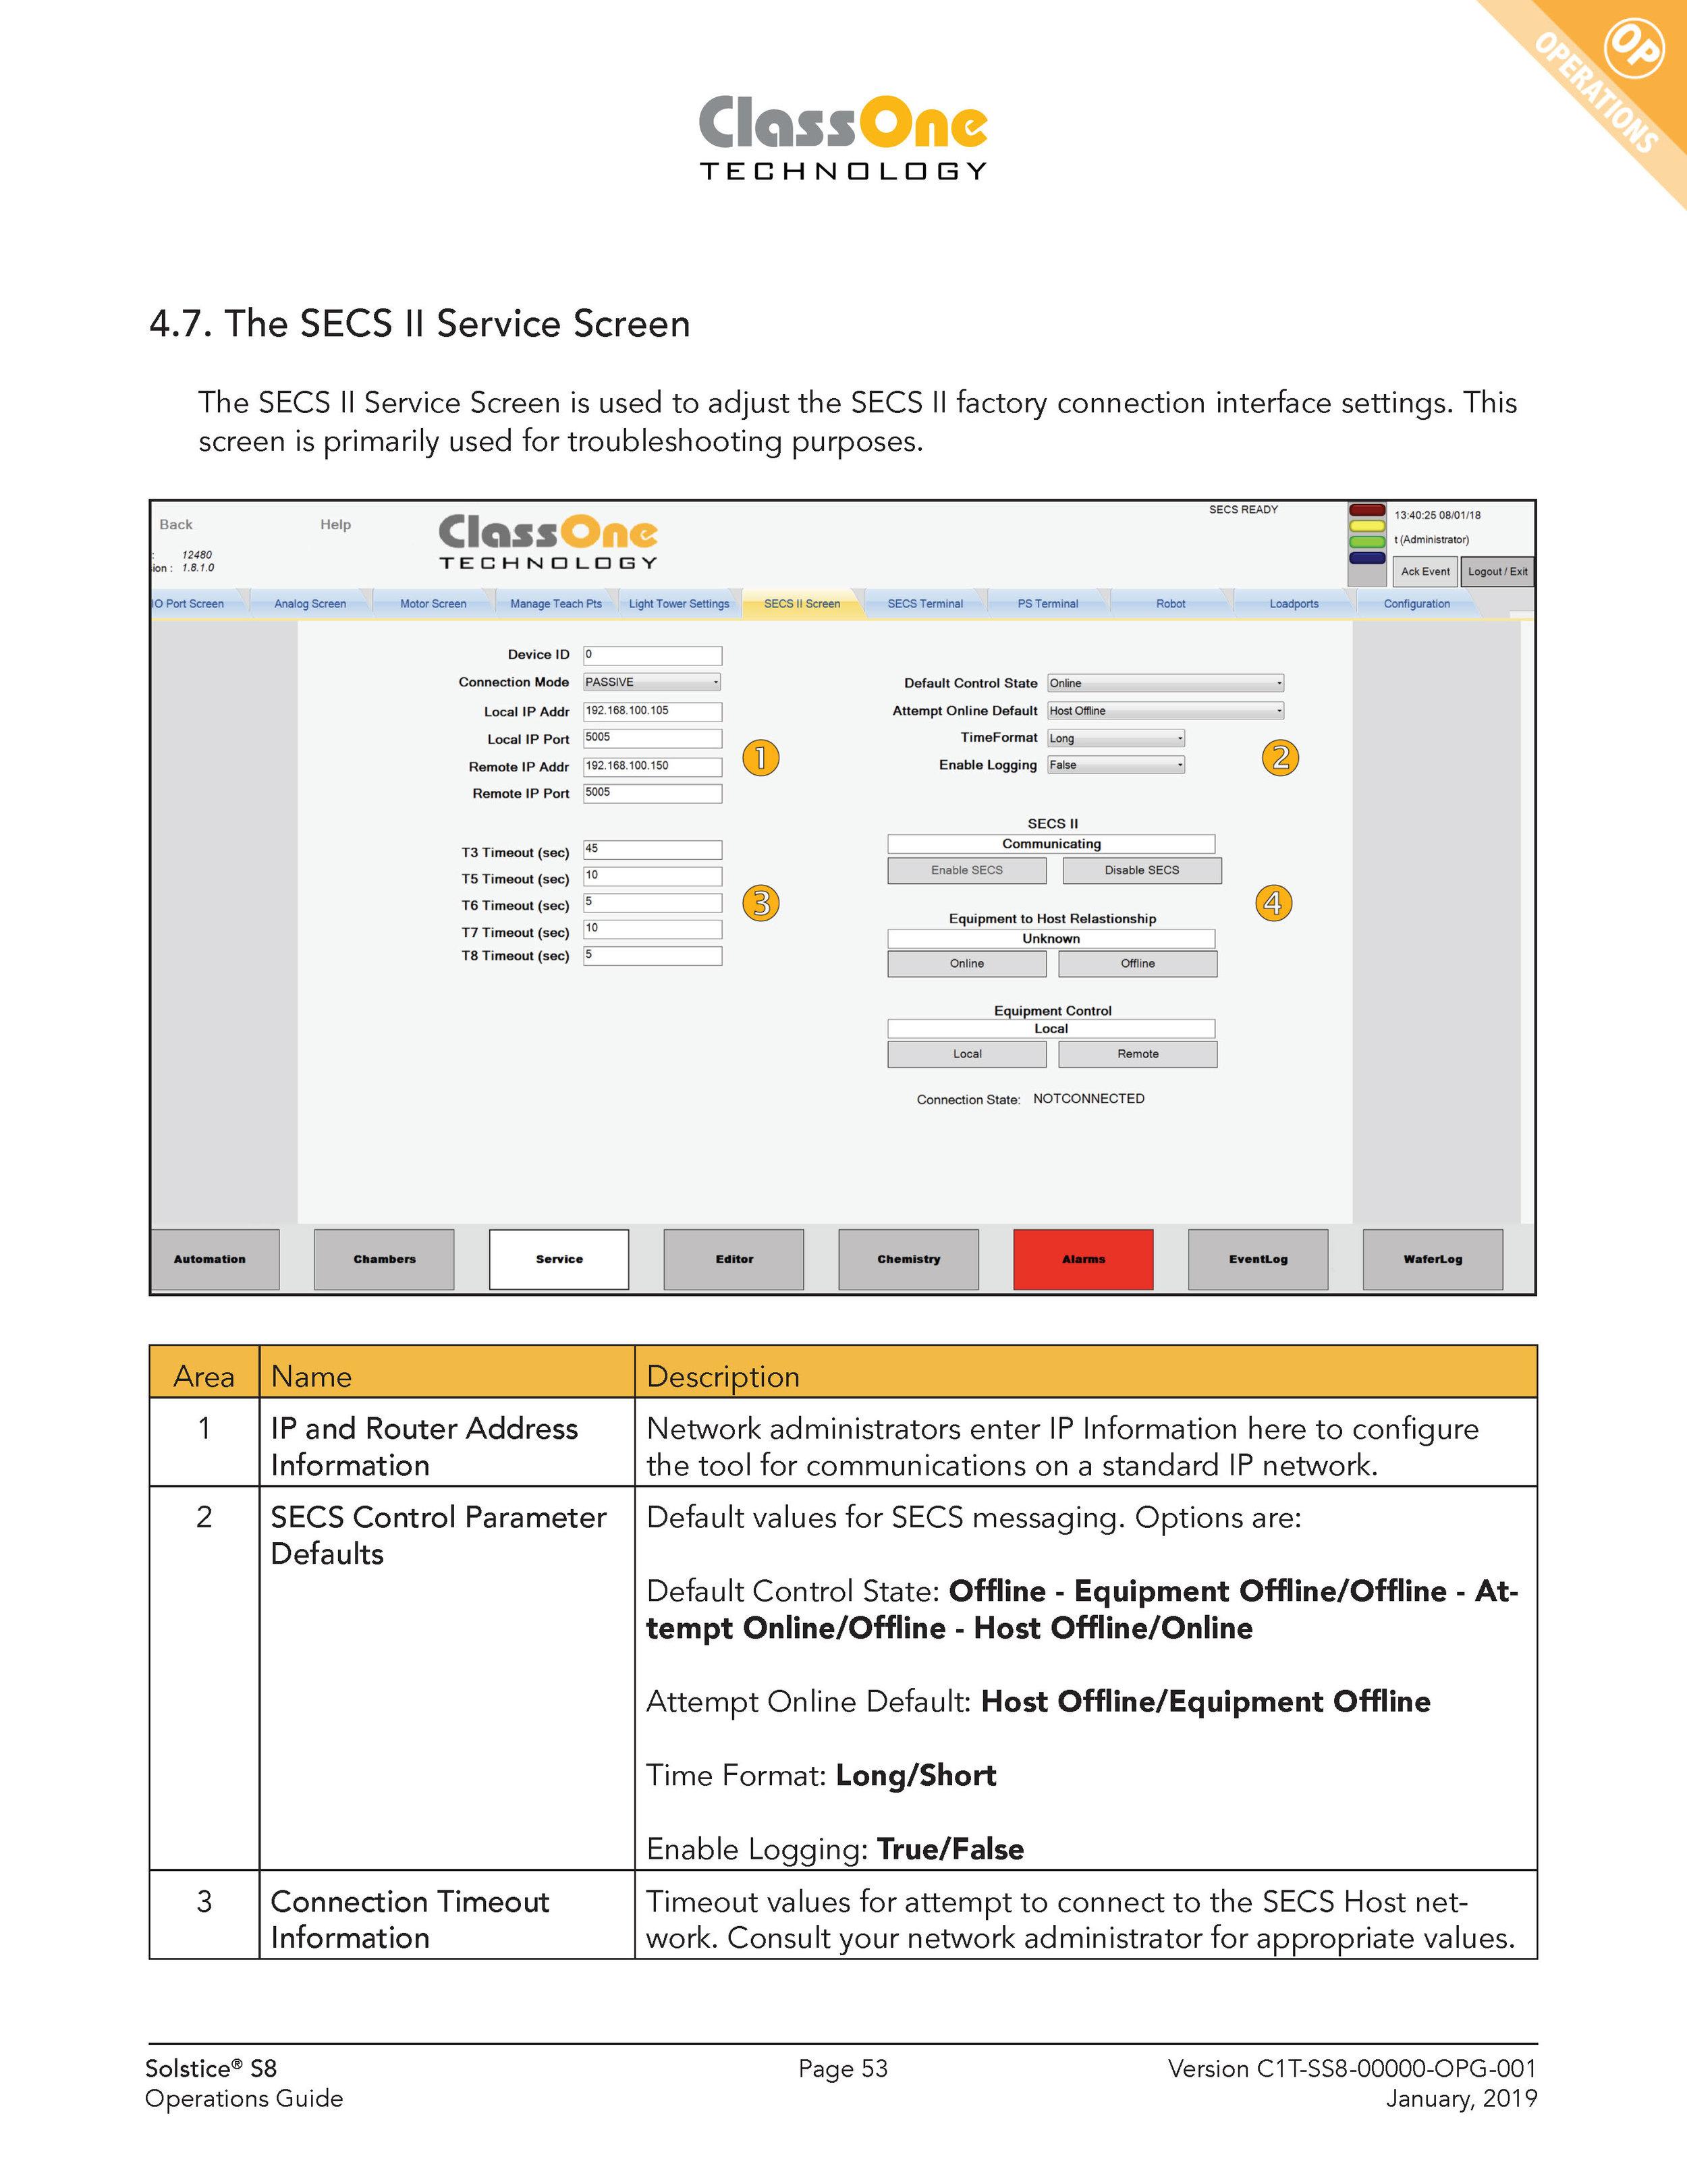 19-01-18 C1T-SS8-00000-OPG-001_Page_053.jpg